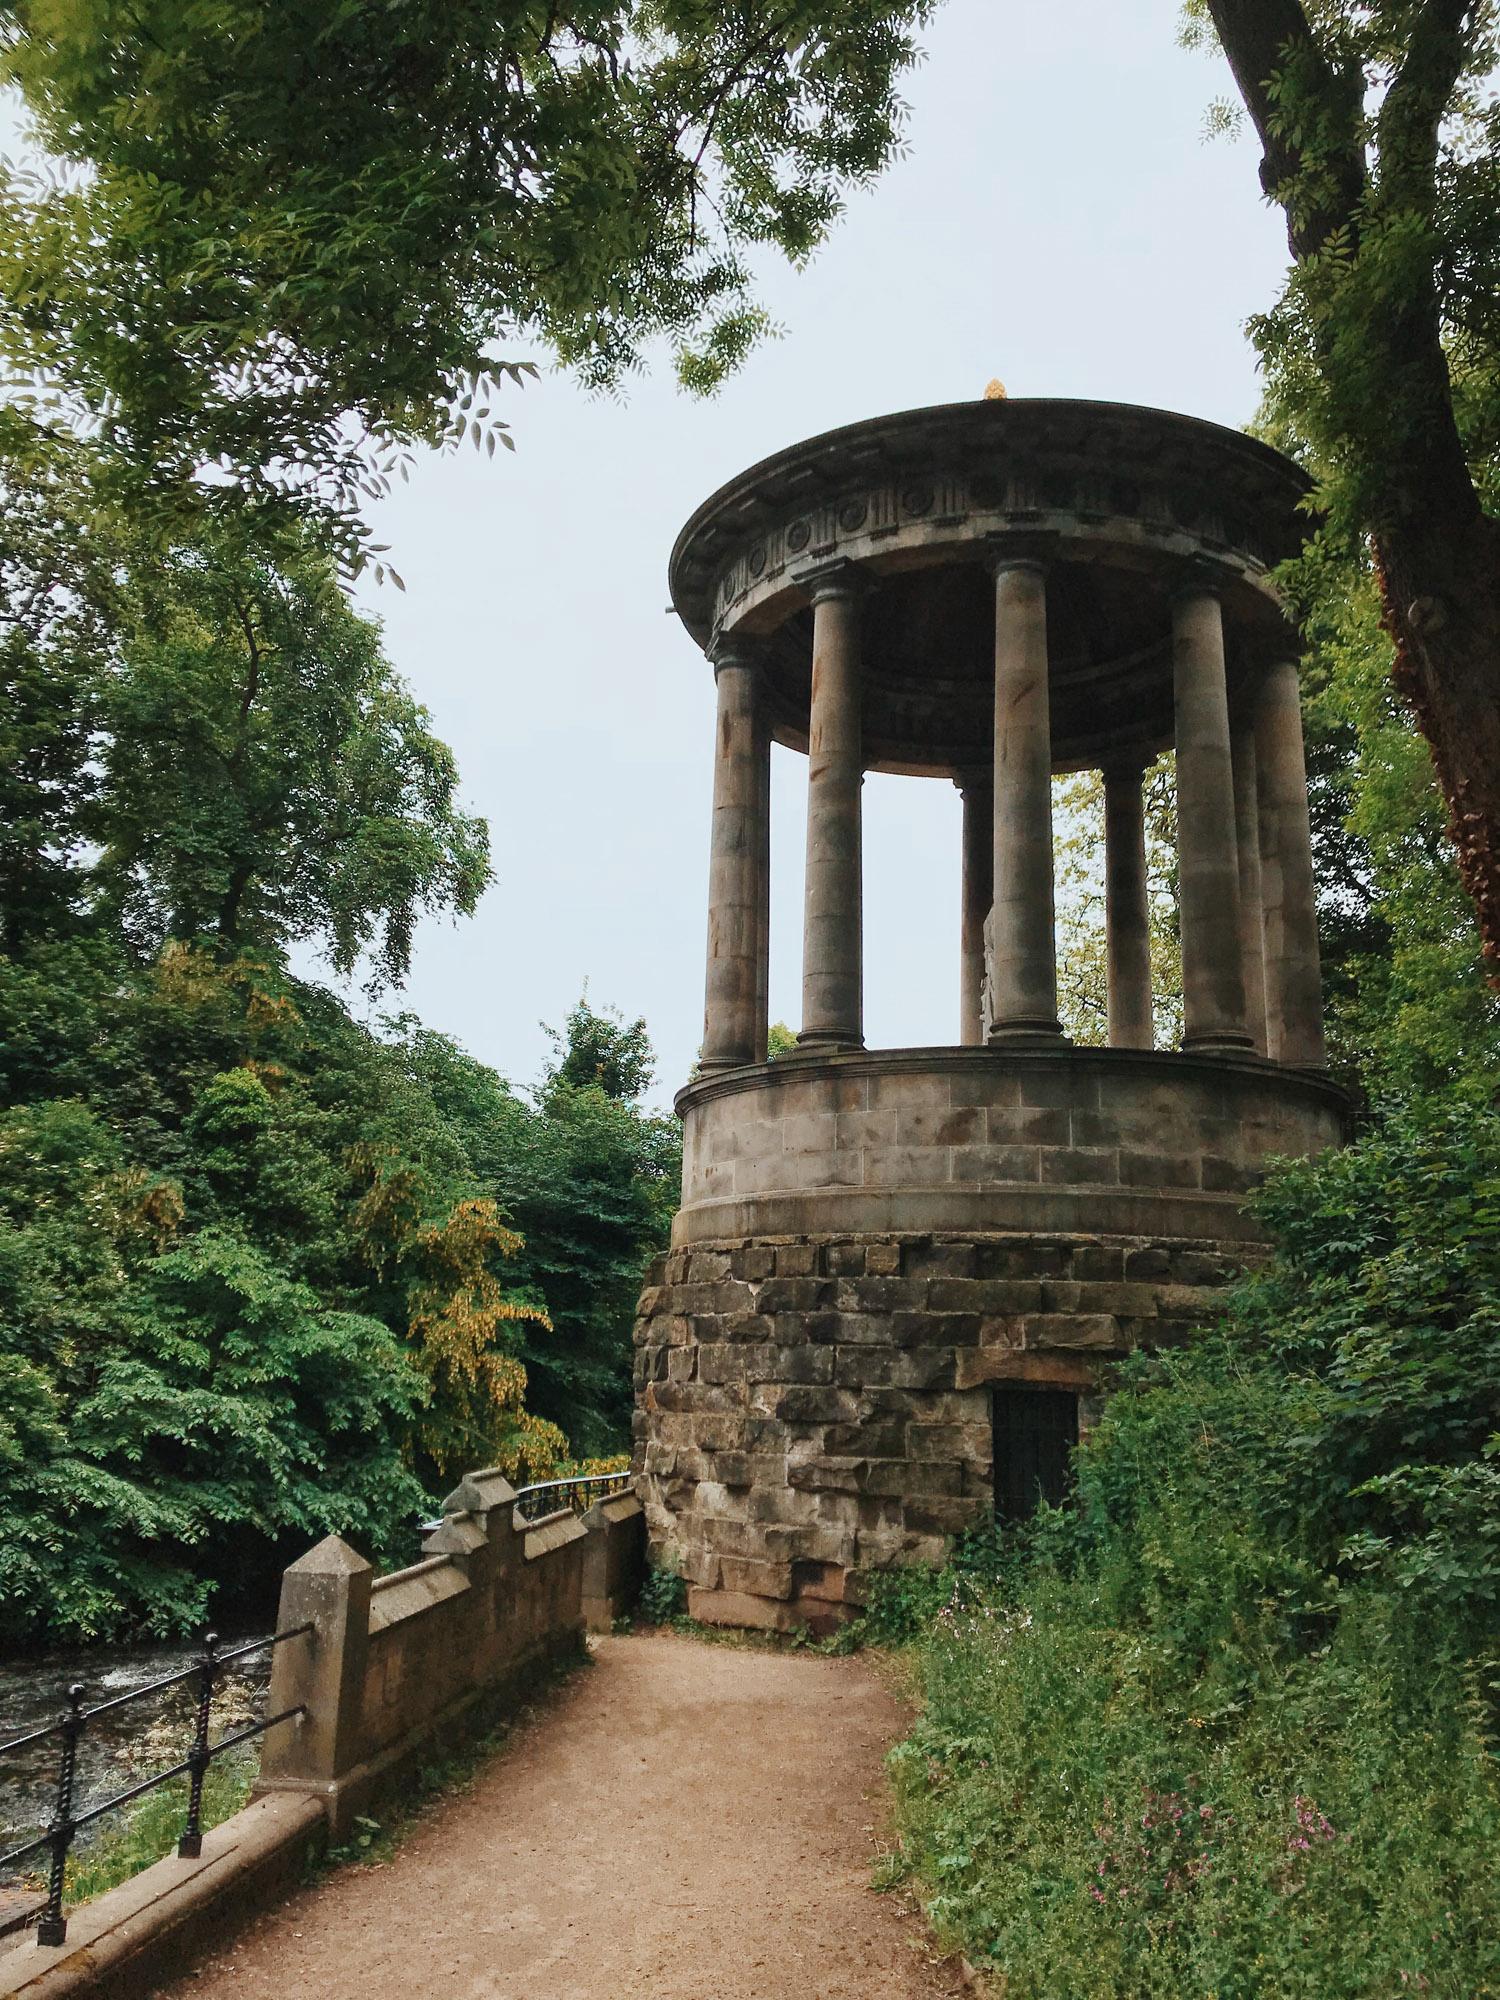 St Bernard's well, Stockbridge